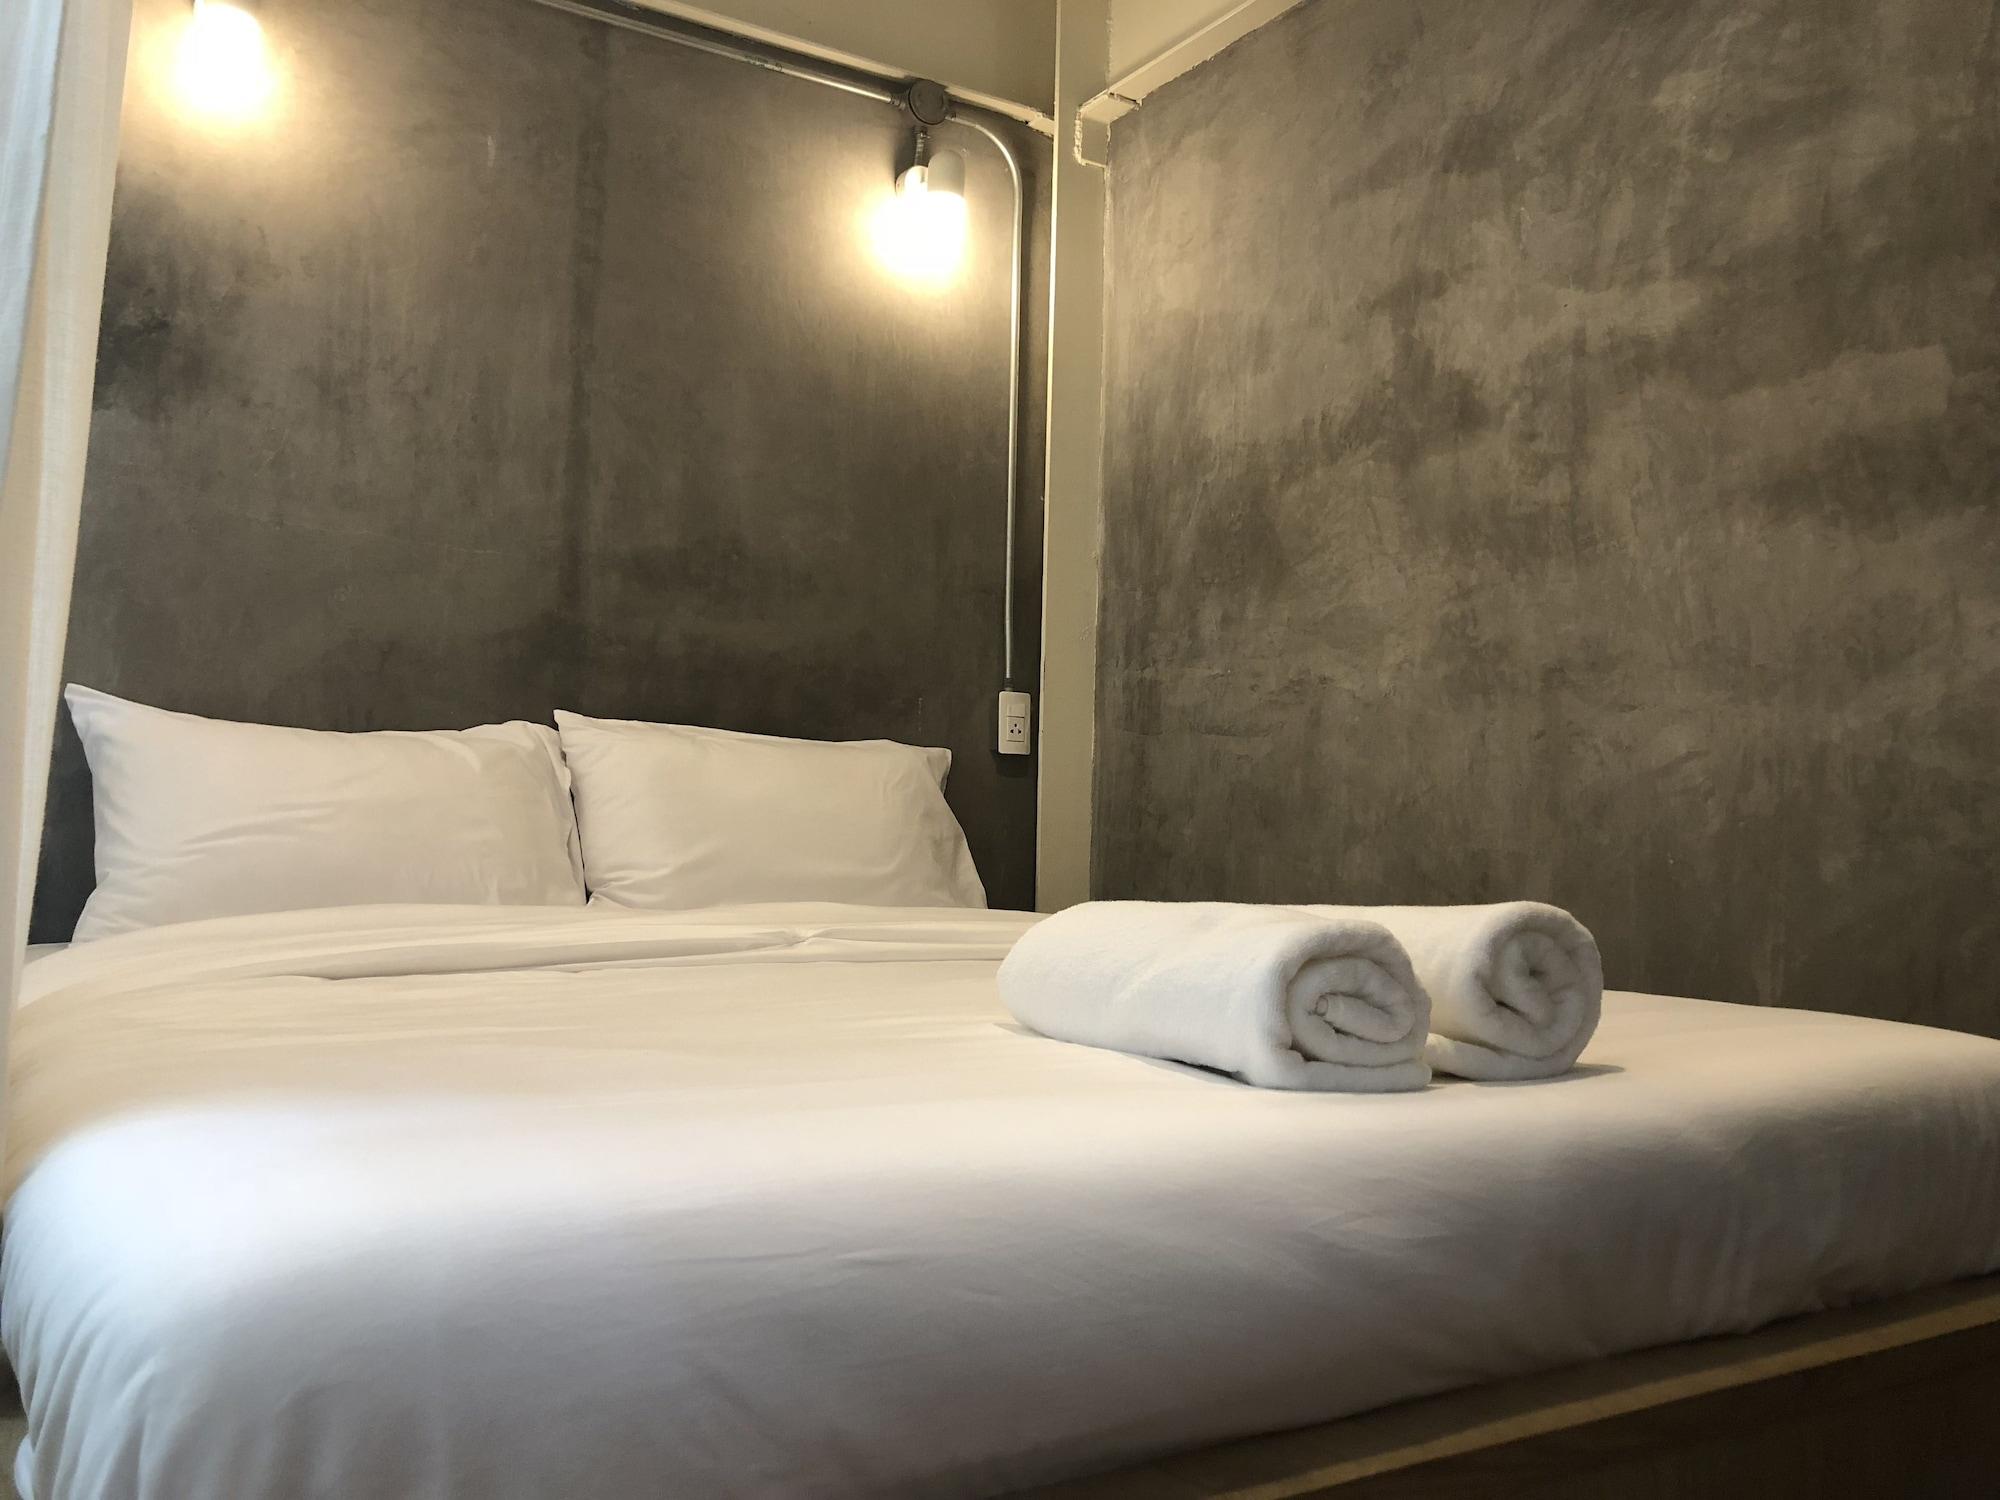 On the bed Hostel, Khlong Toey